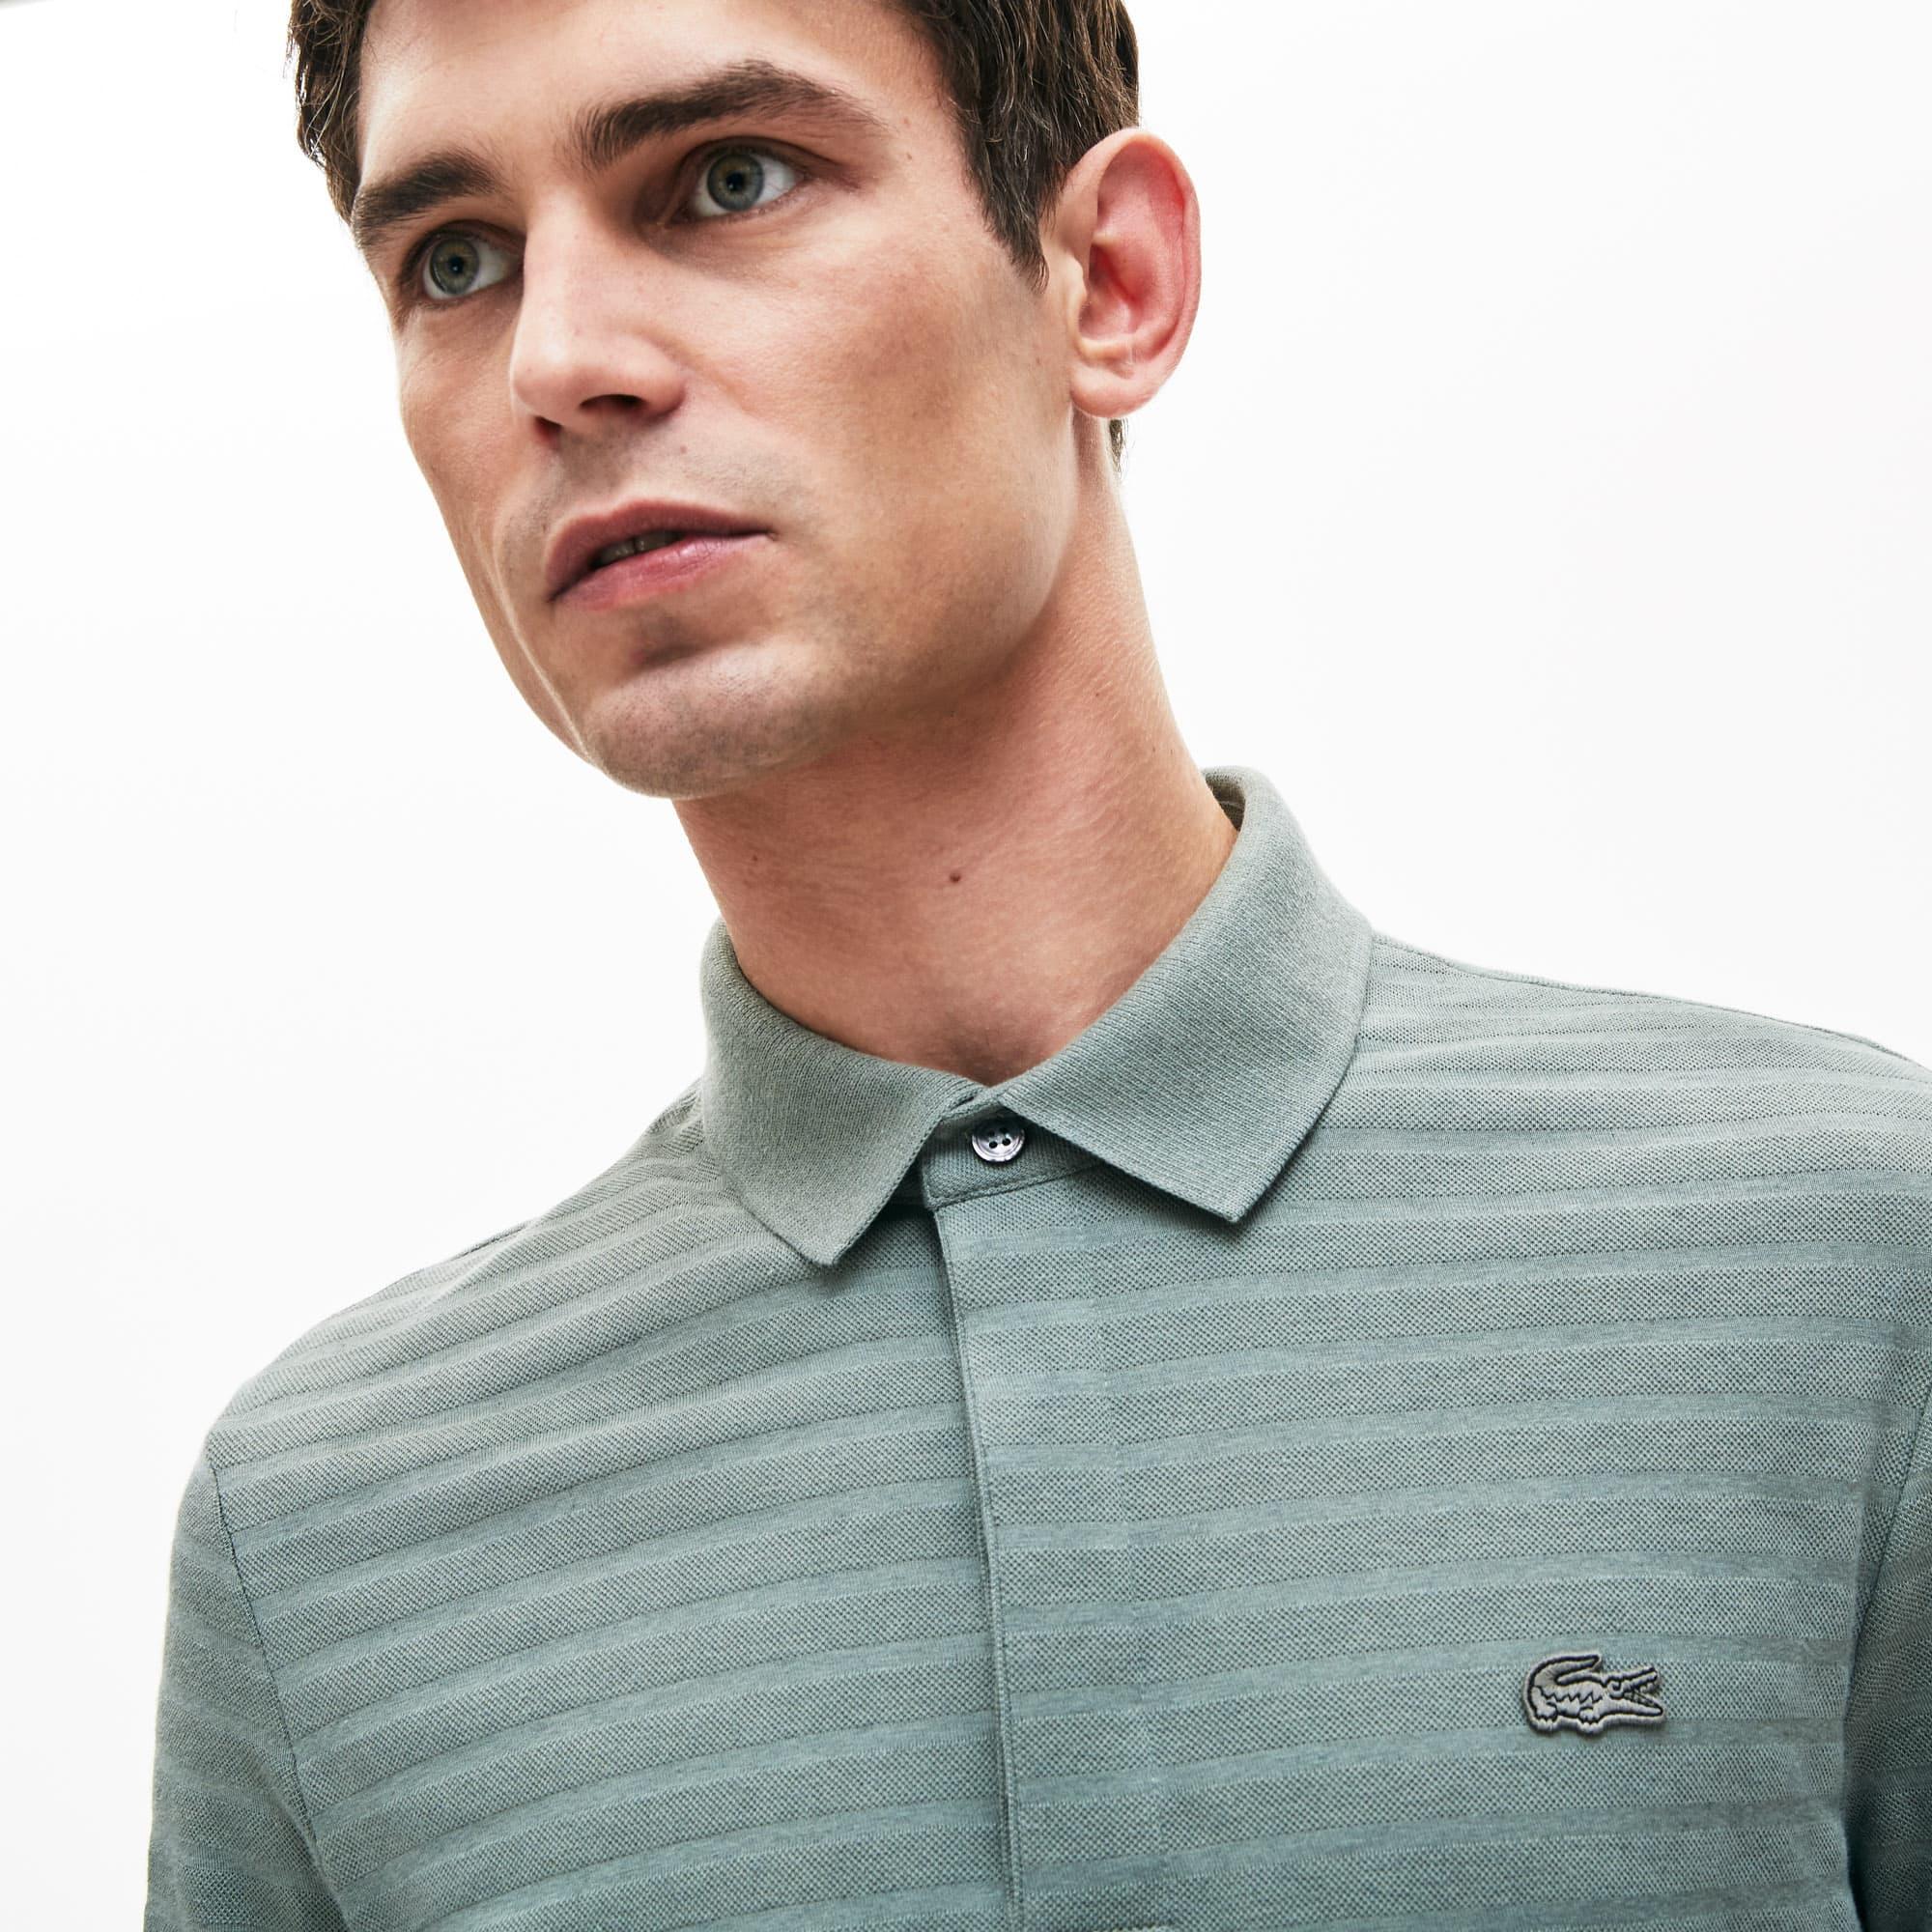 Lacoste Tops Men's Regular Fit Striped Cotton And Cashmere Piqué Polo Shirt